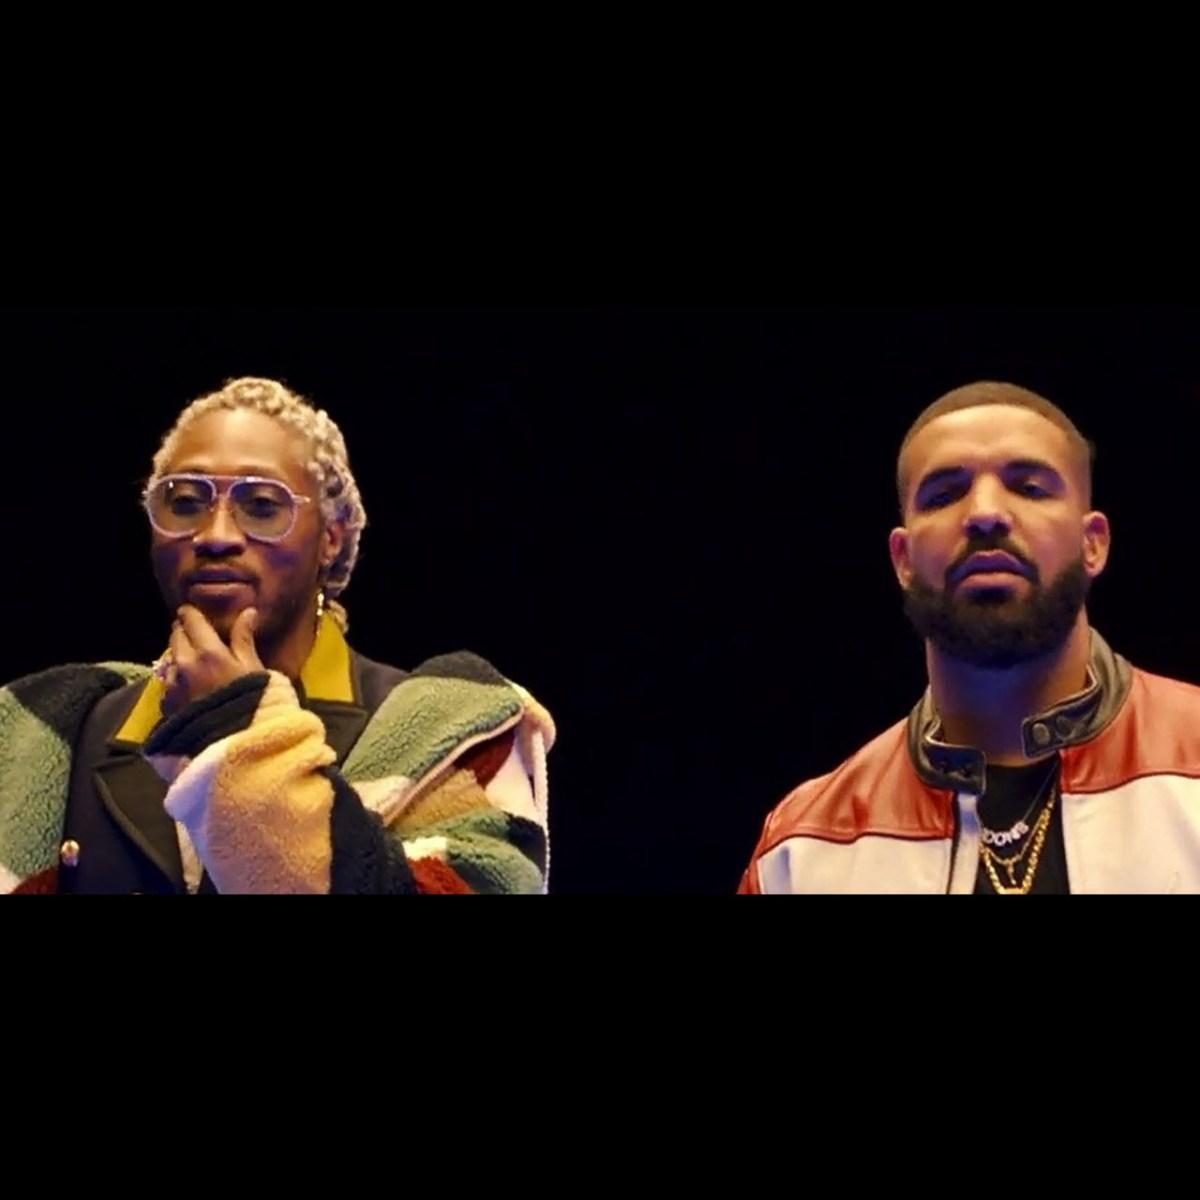 Future - Life Is Good (ft. Drake) (Thumbnail)